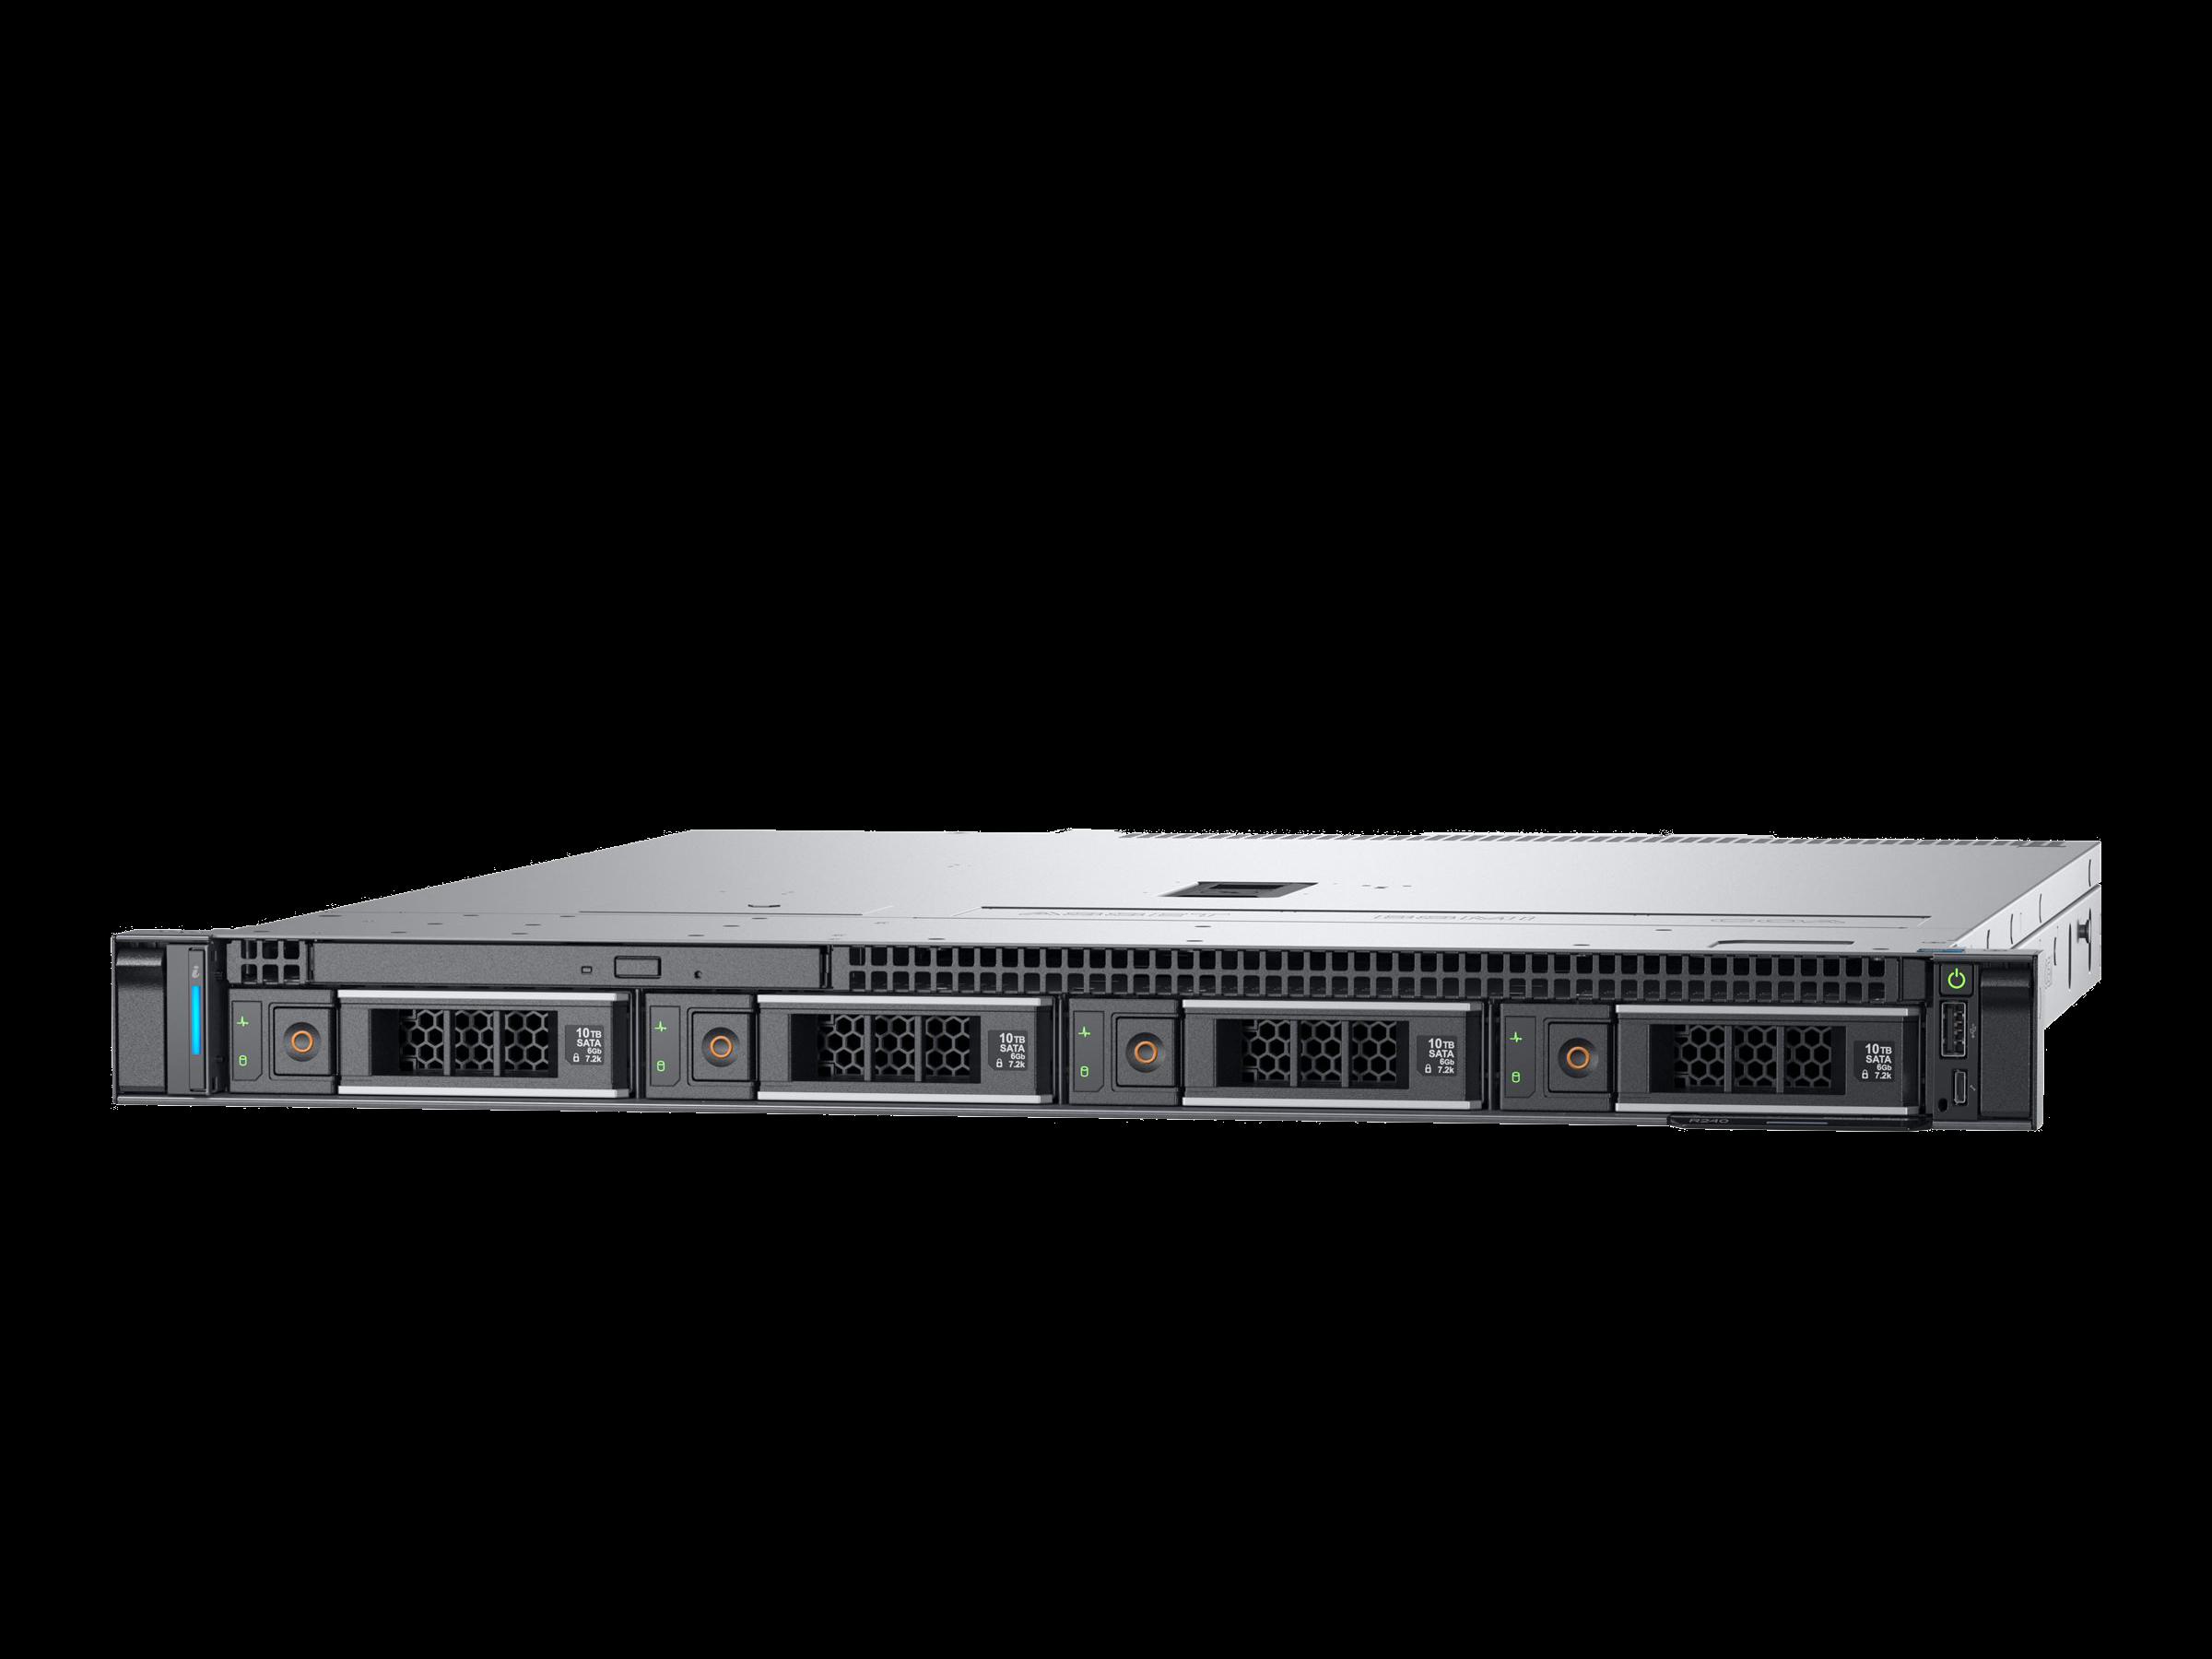 Dell EMC PowerEdge R240 Image